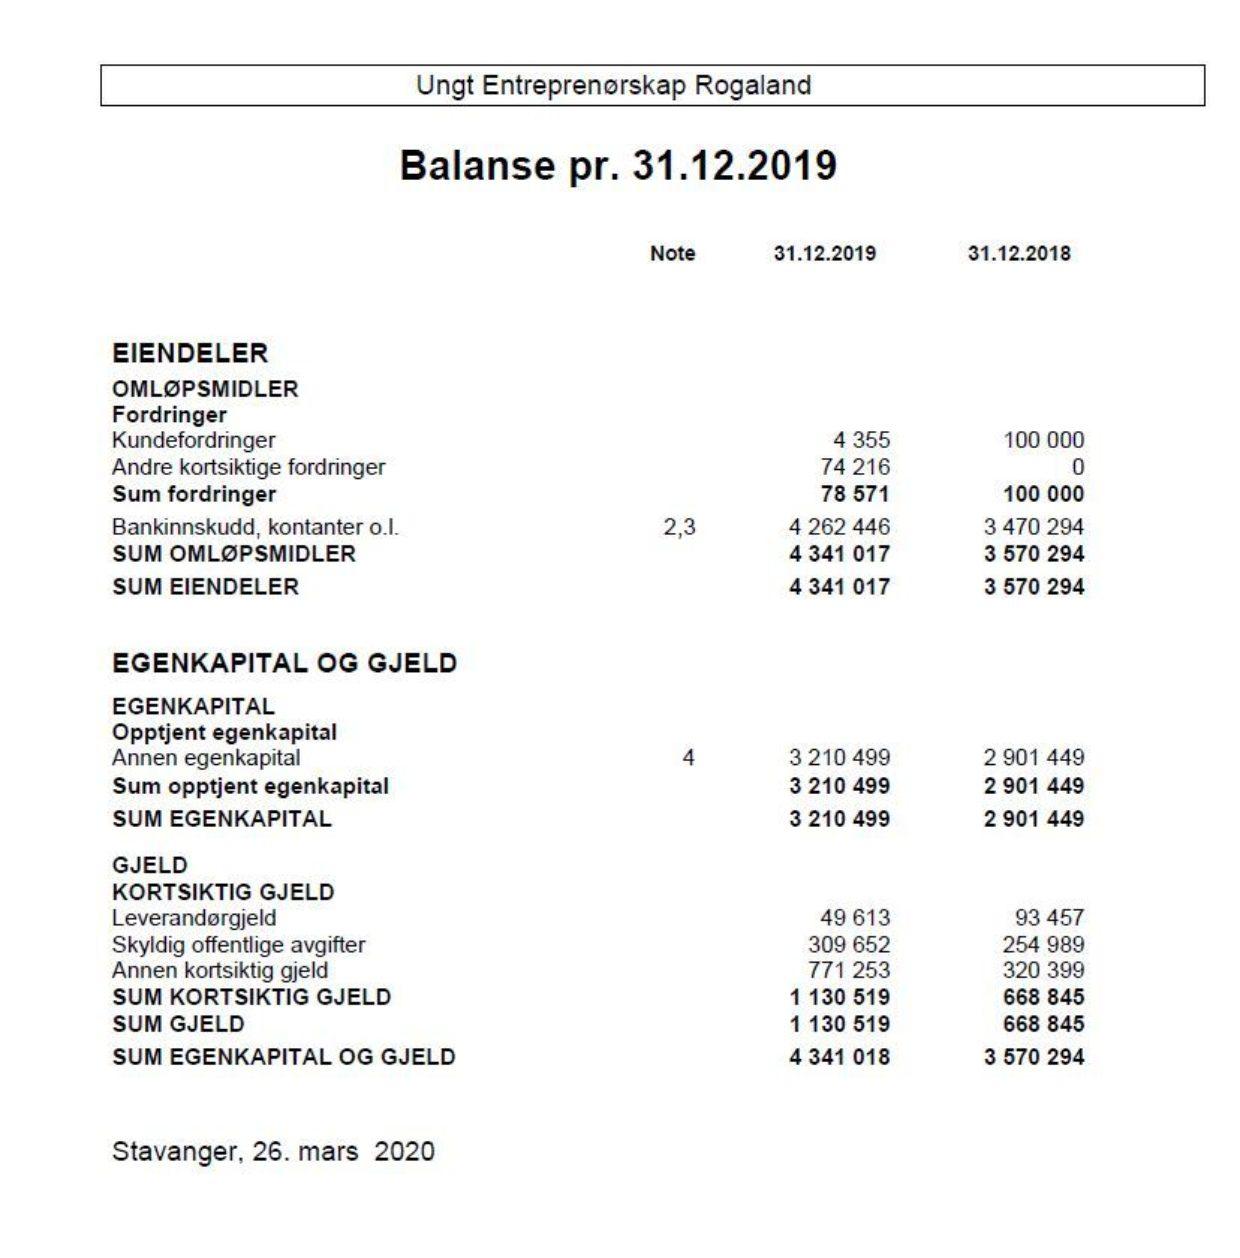 2019 Balanse